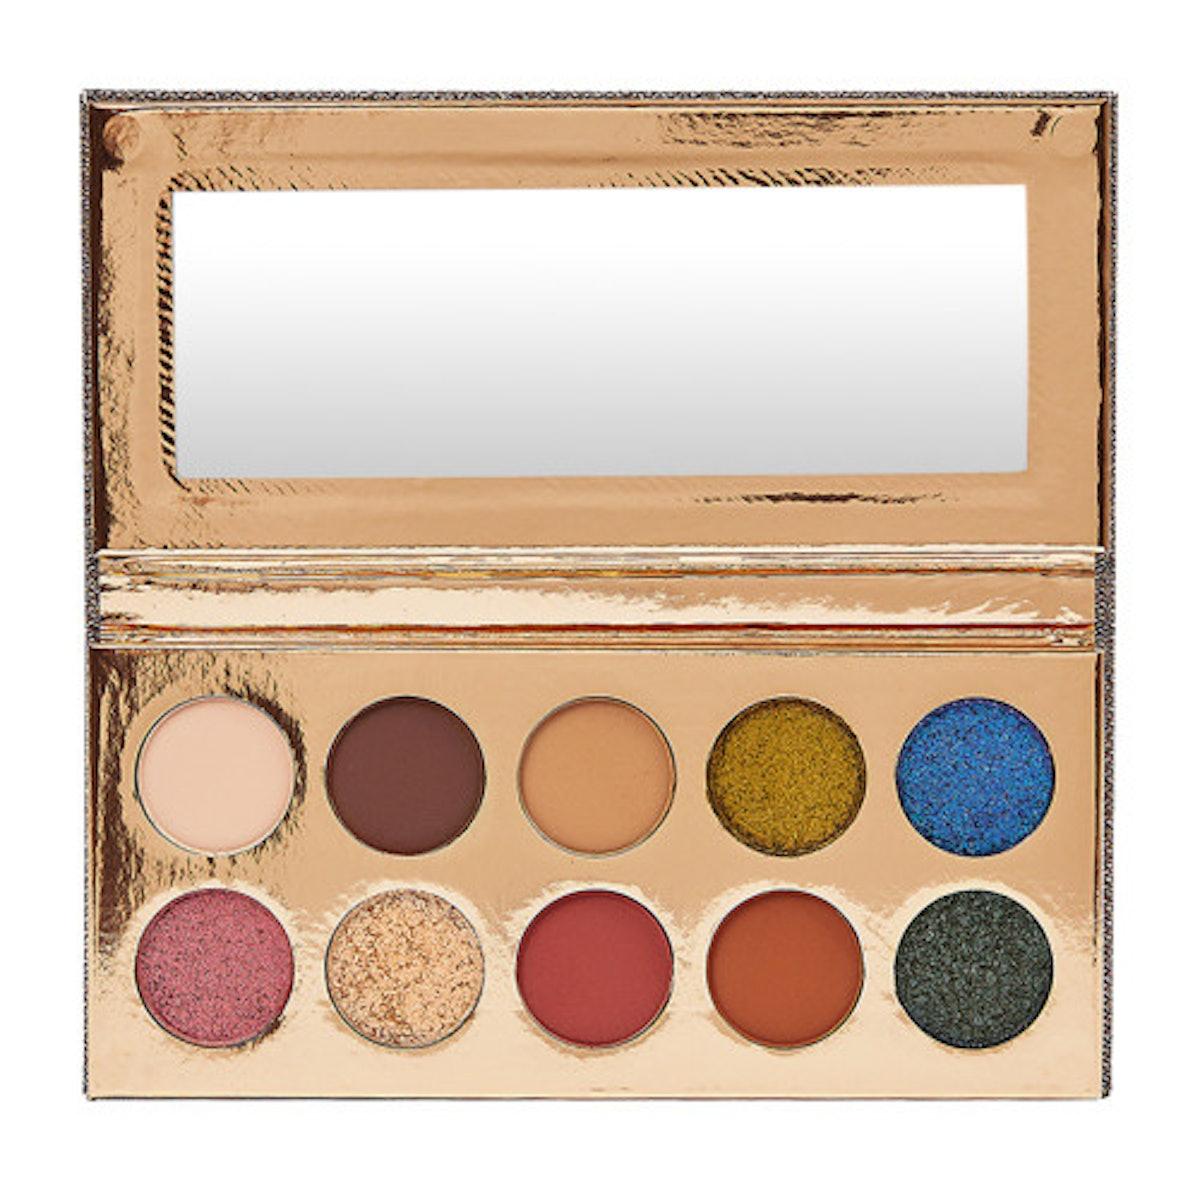 Desi x Katy Eyeshadow Palette Friendcation